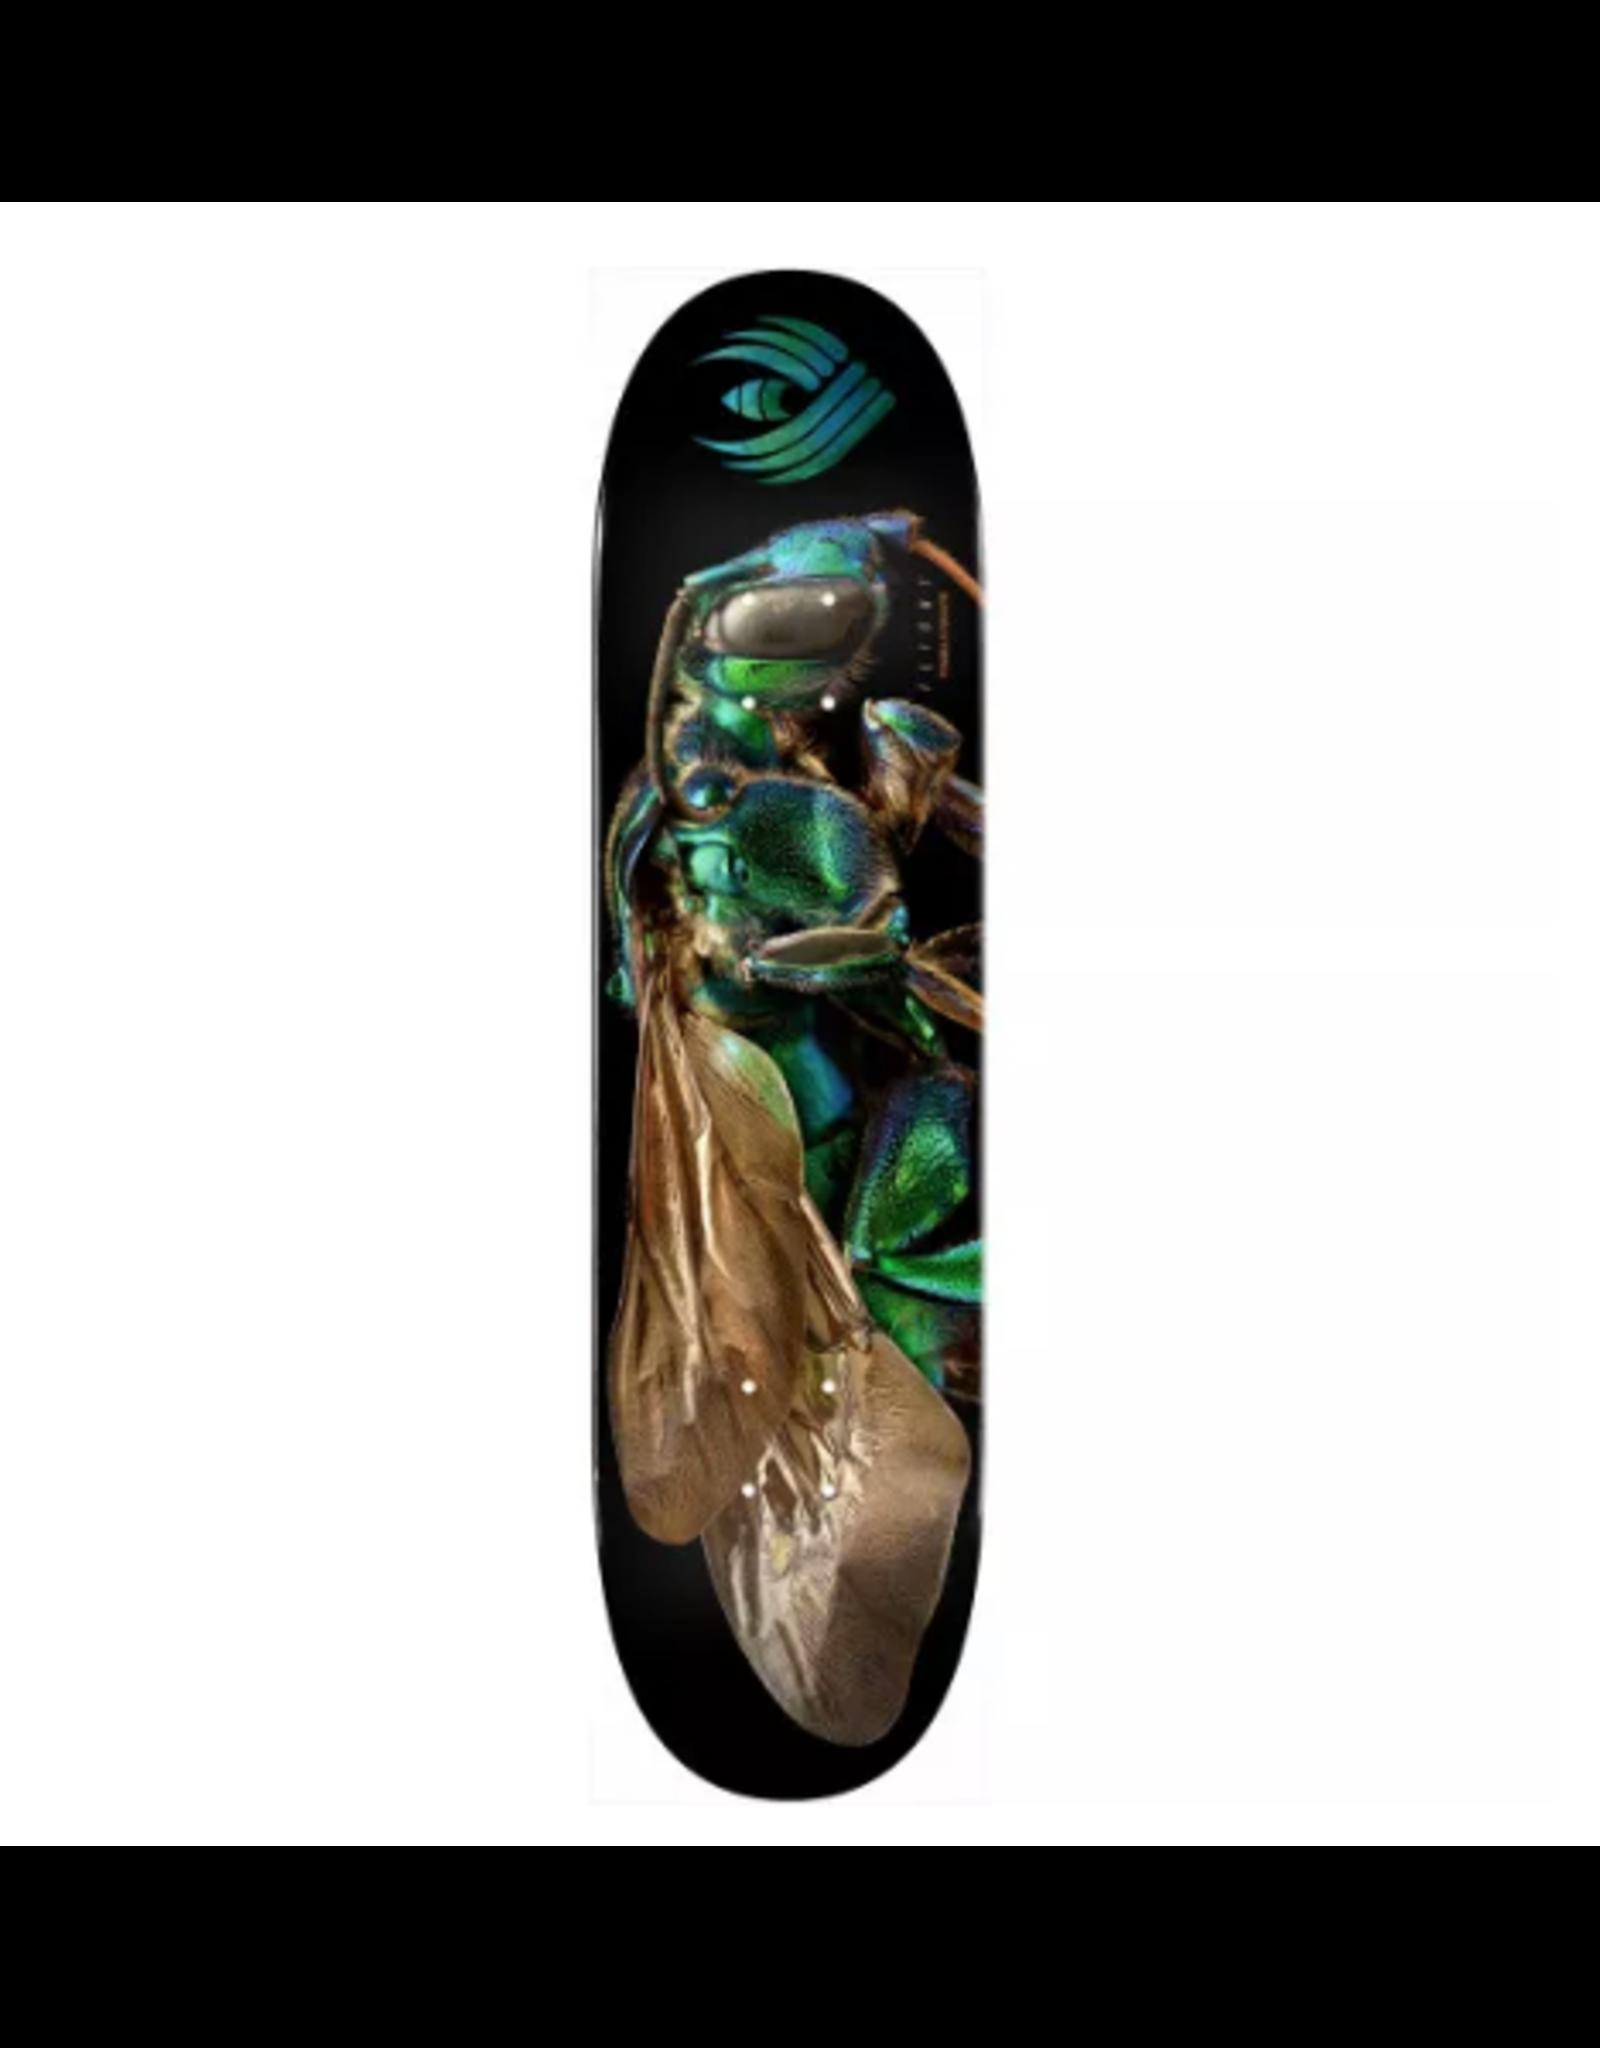 POWELL Powell Peralta Flight® Skateboard Deck BISS Cuckoo Bee - Shape 242 - 8 x 31.45